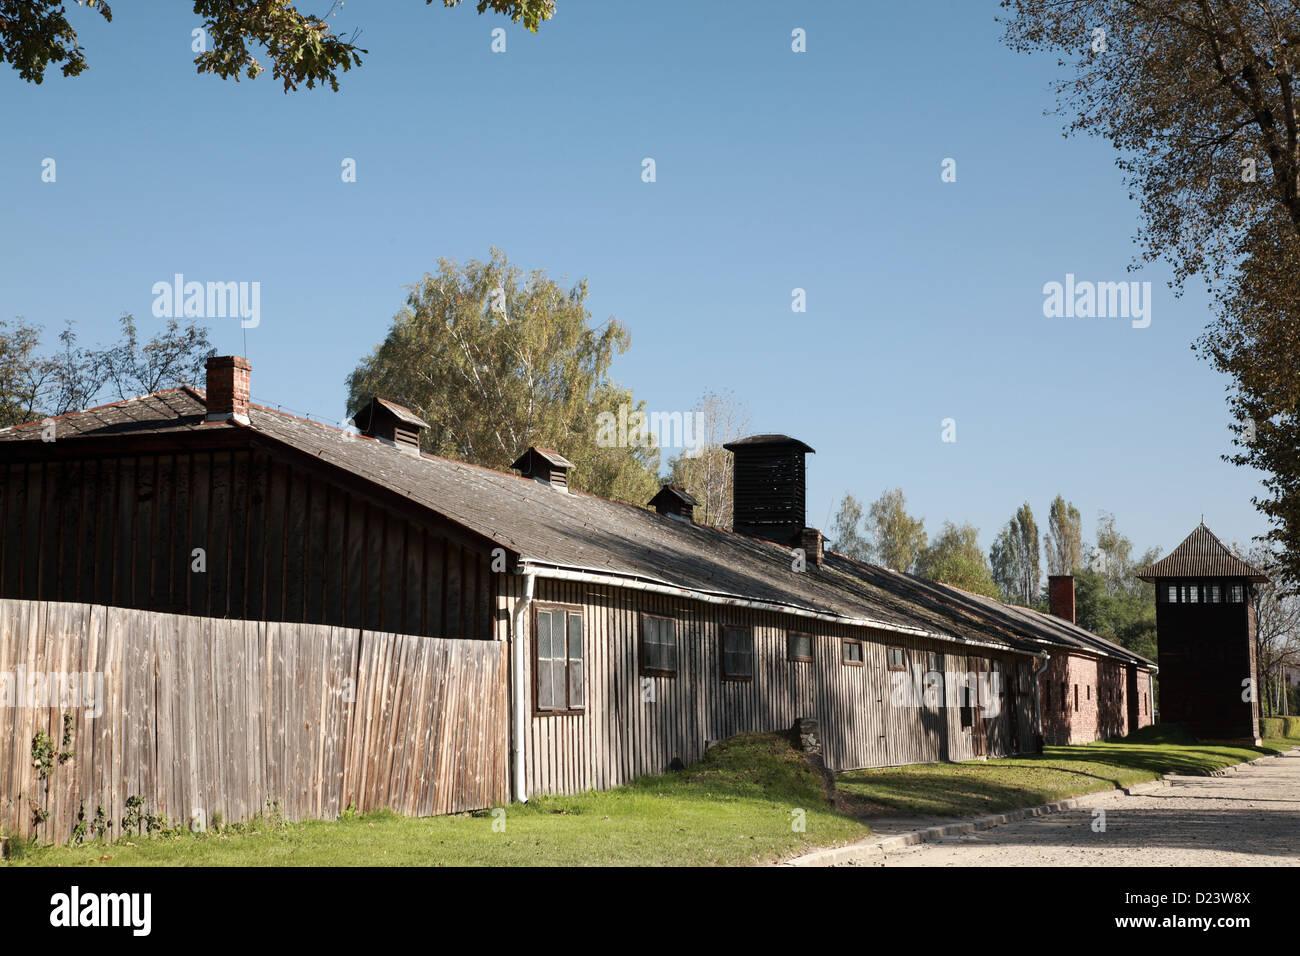 Wooden barrack Auschwitz-Birkenau concentration camp, Poland - Stock Image